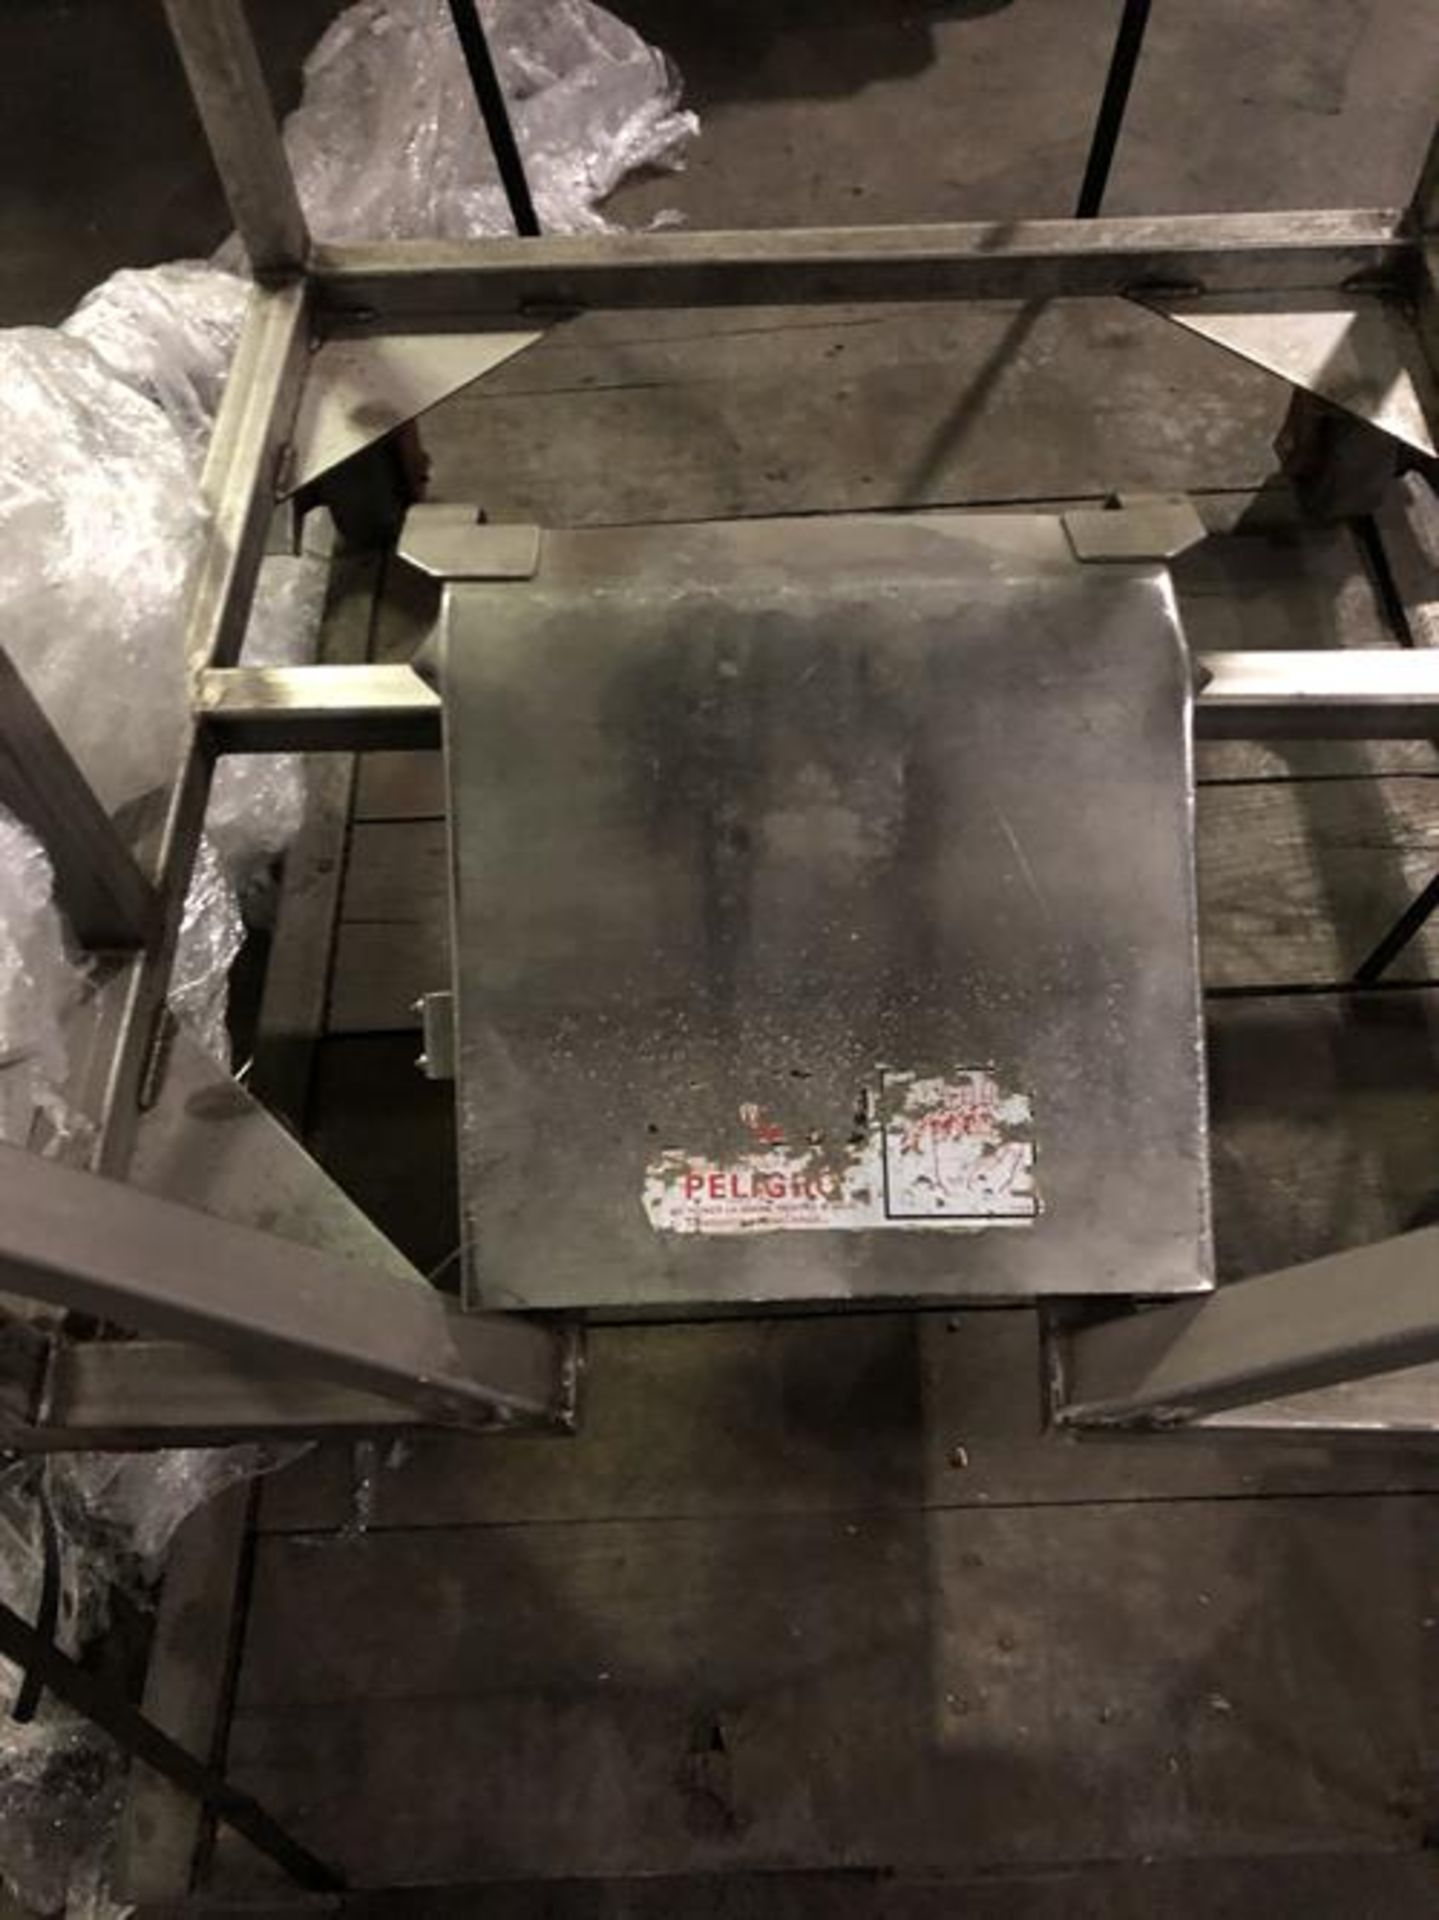 Urschel model N Stainless Steel Granulator - Vibrator pan feeder with variable speed rheostat - - Image 18 of 18